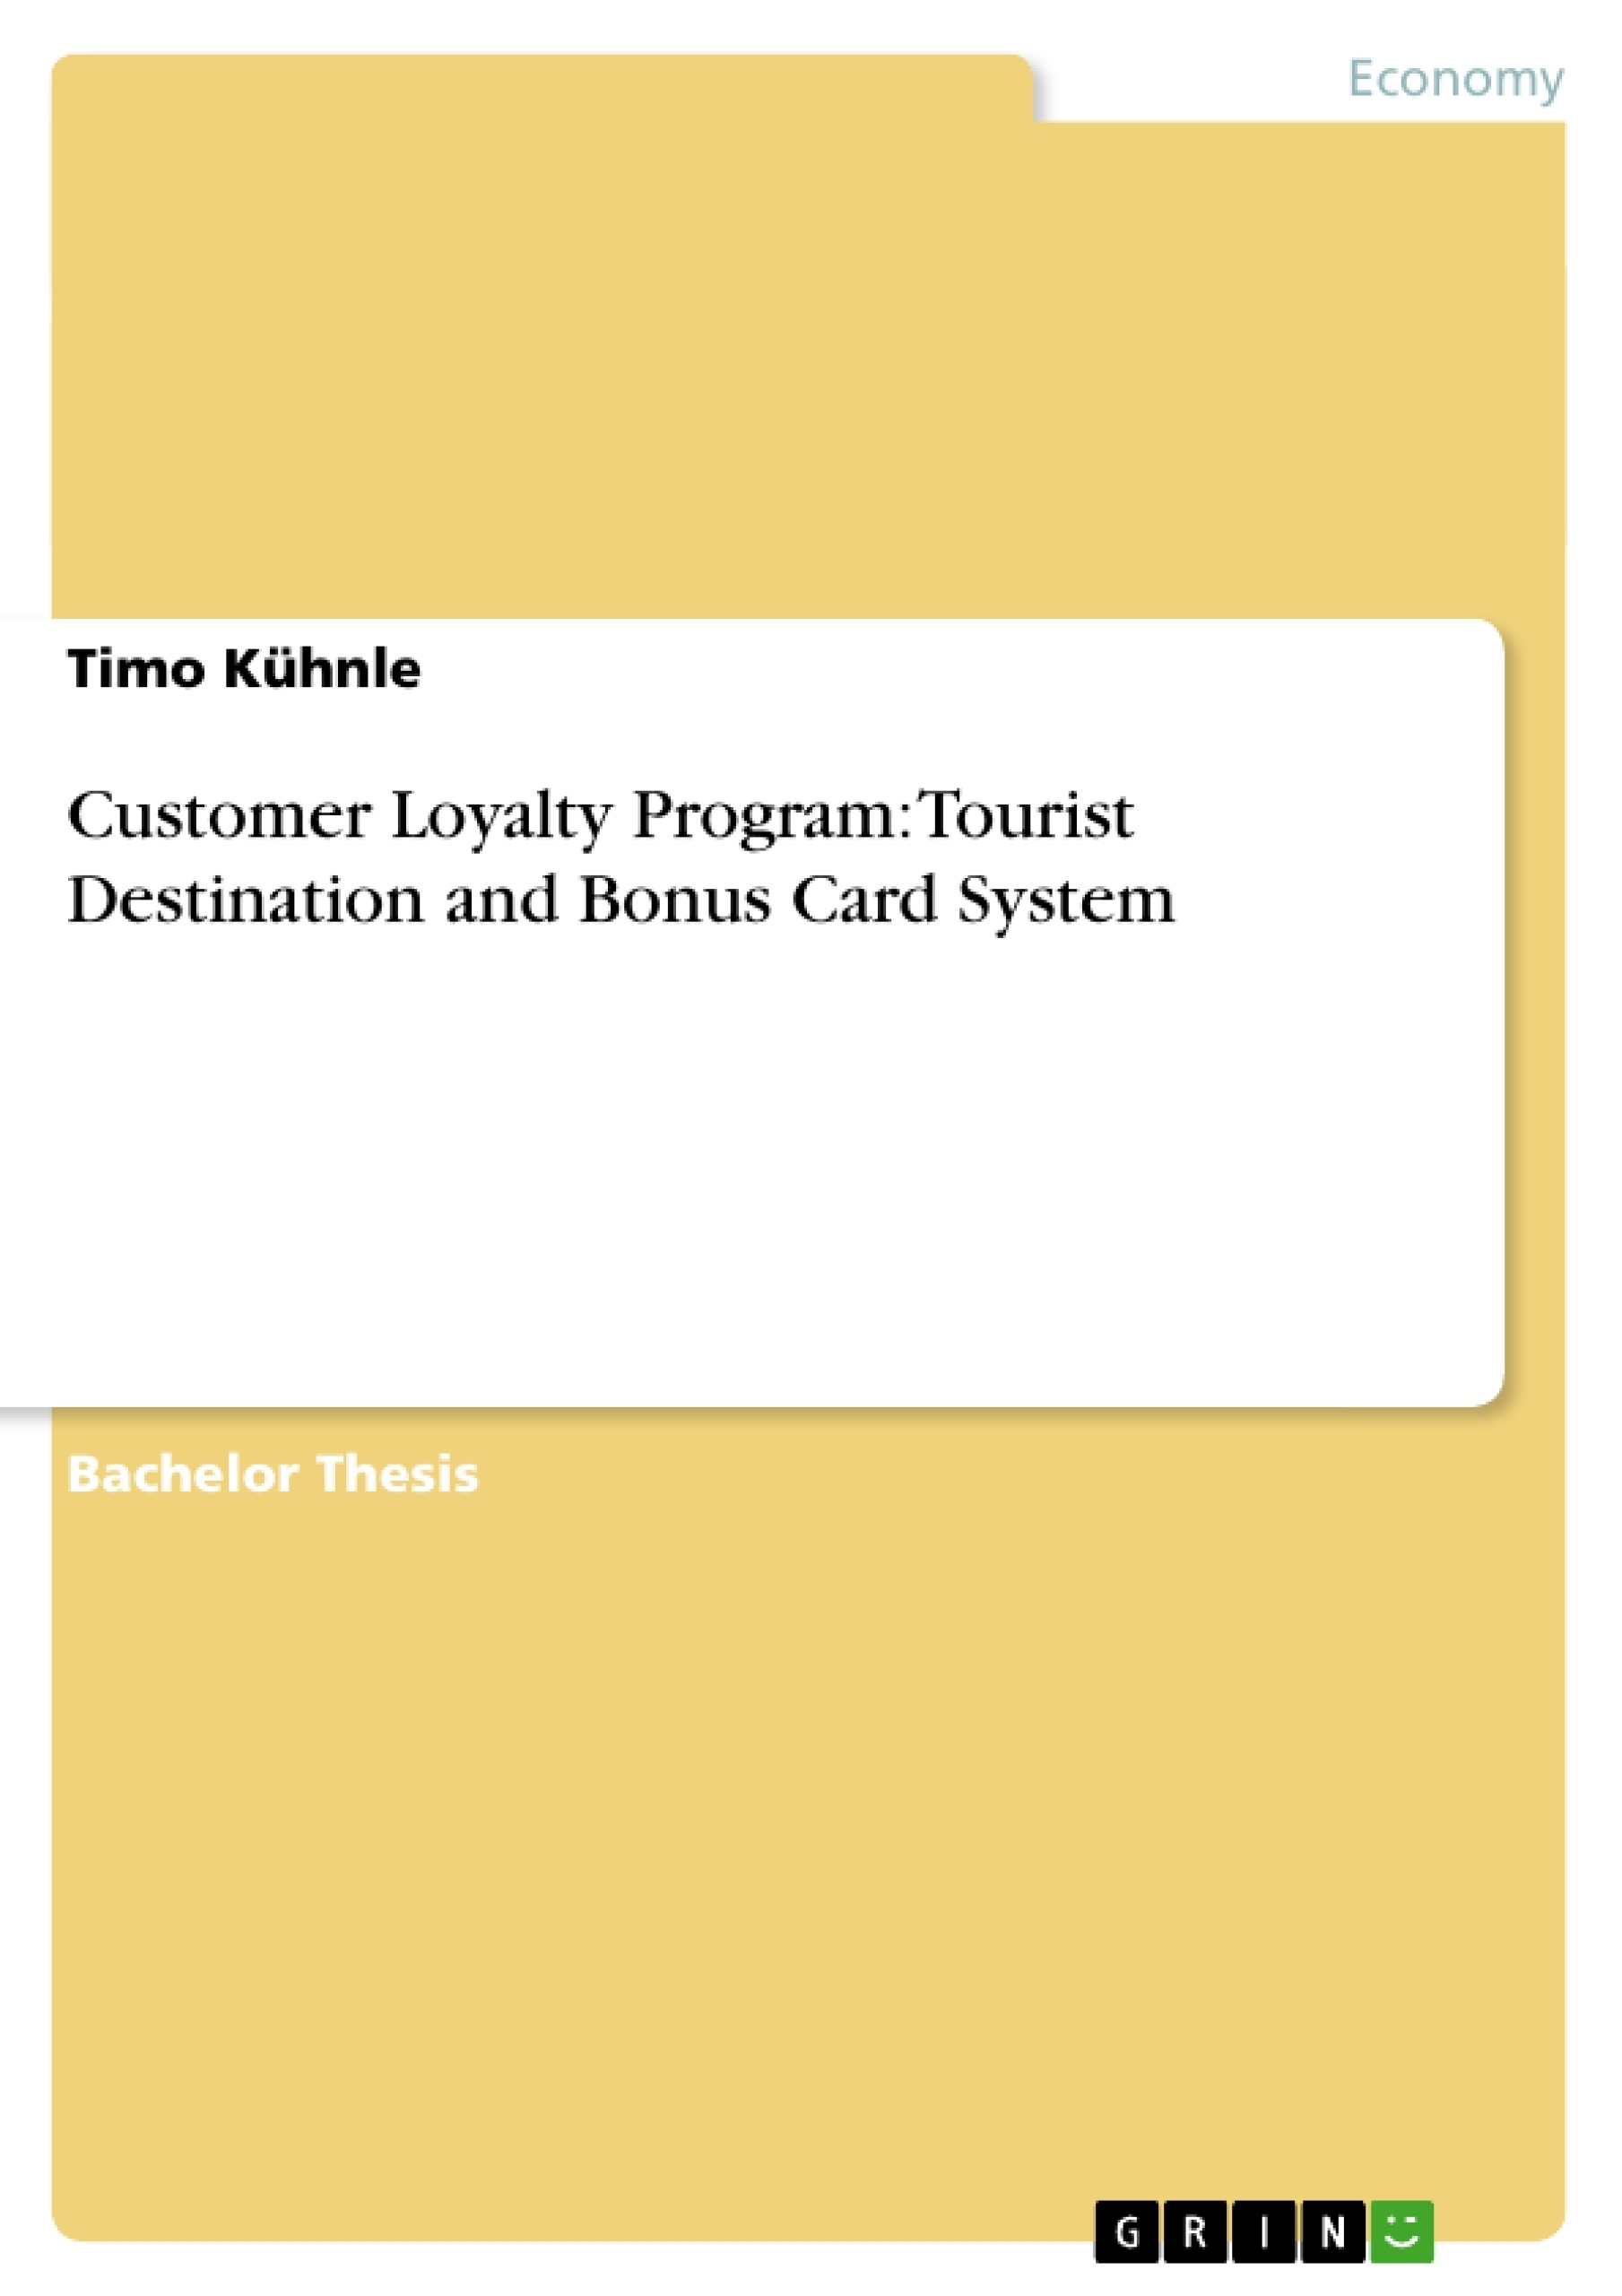 Title: Customer Loyalty Program: Tourist Destination and Bonus Card System